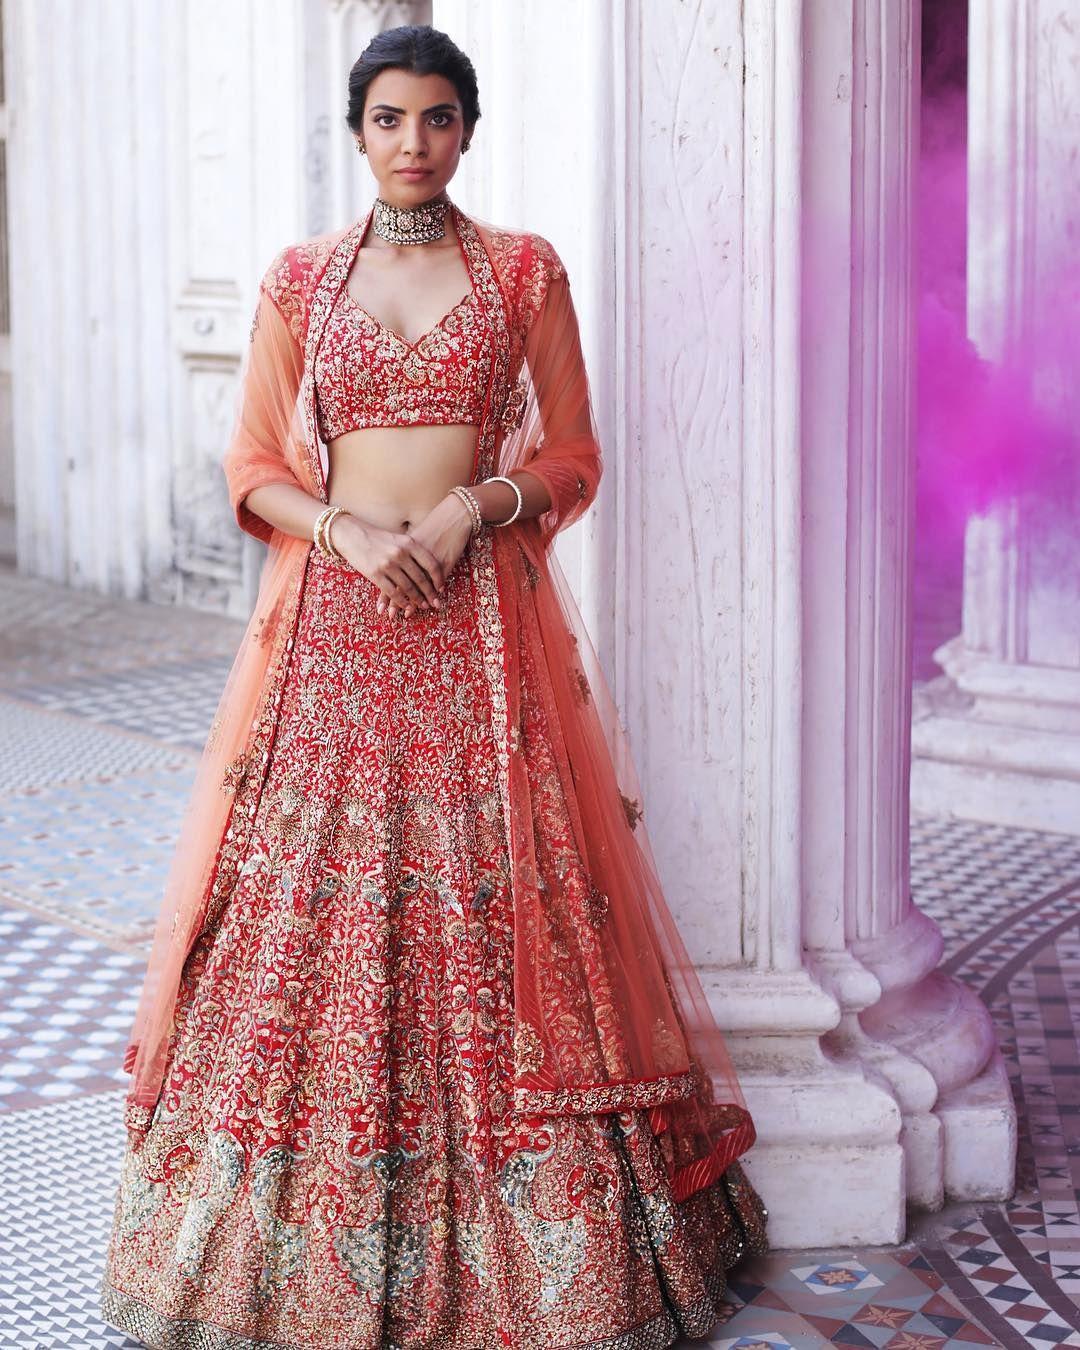 Best wedding dress boutiques in london  Shyamal u Bhumika collection  Lengha choli  Pinterest  Indian